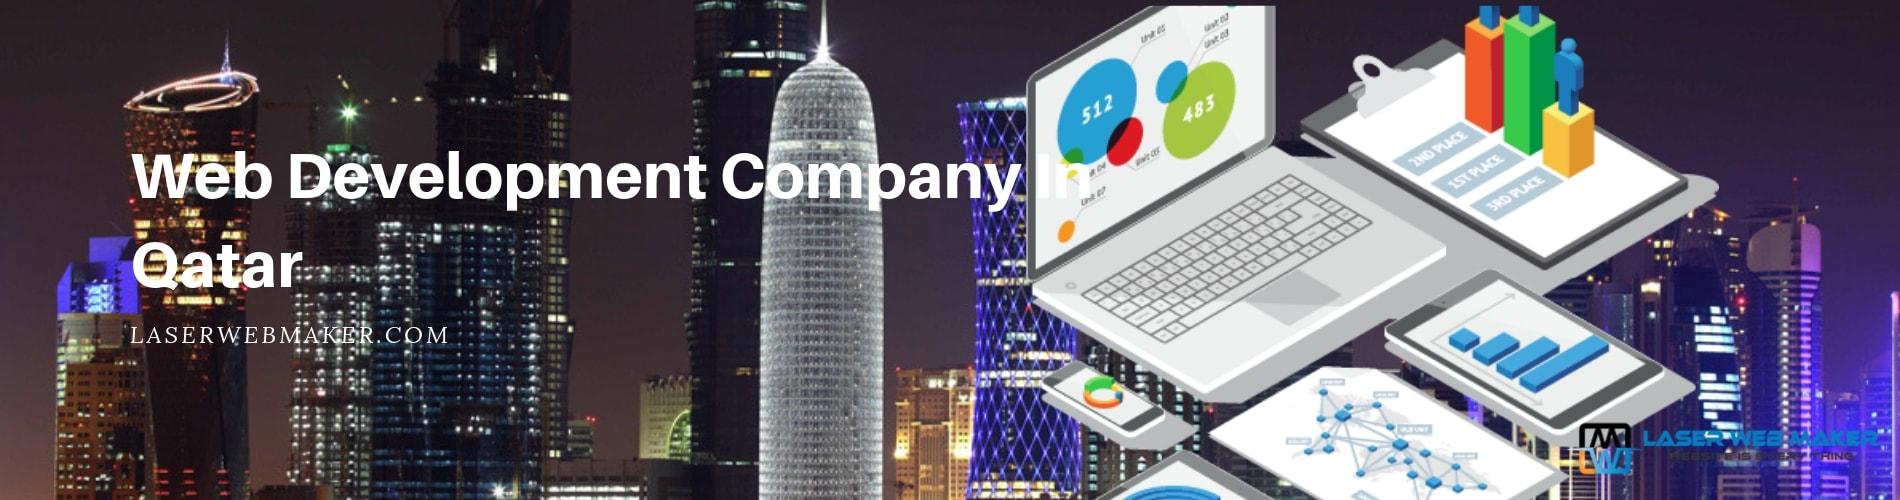 web development company in doha,qatar